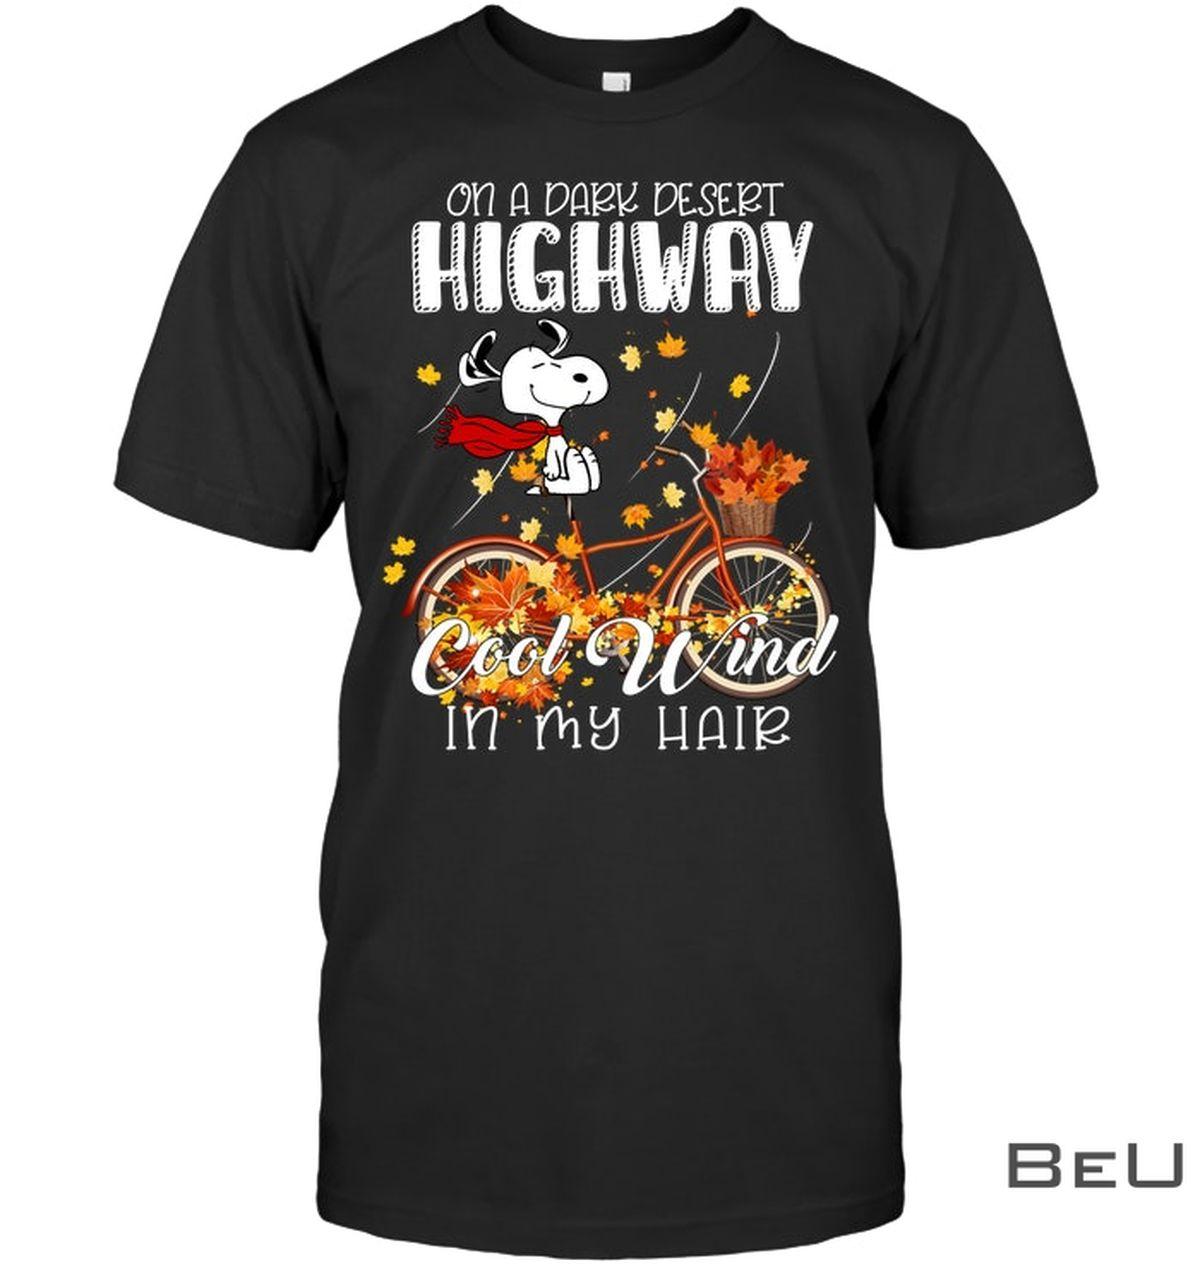 Snoopy On The Dark Desert Highway Cool Wind In My Hair Shirt